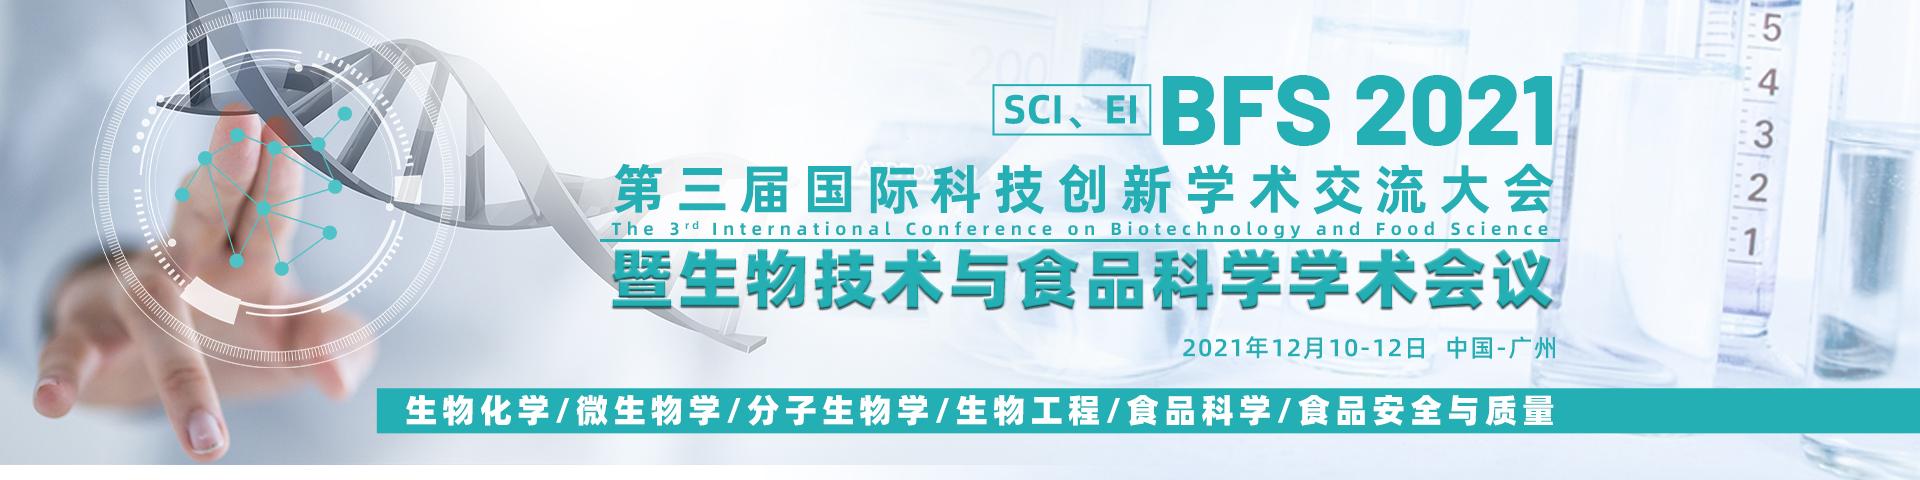 12月广州BFS2021-banner-何霞丽-20210312.jpg